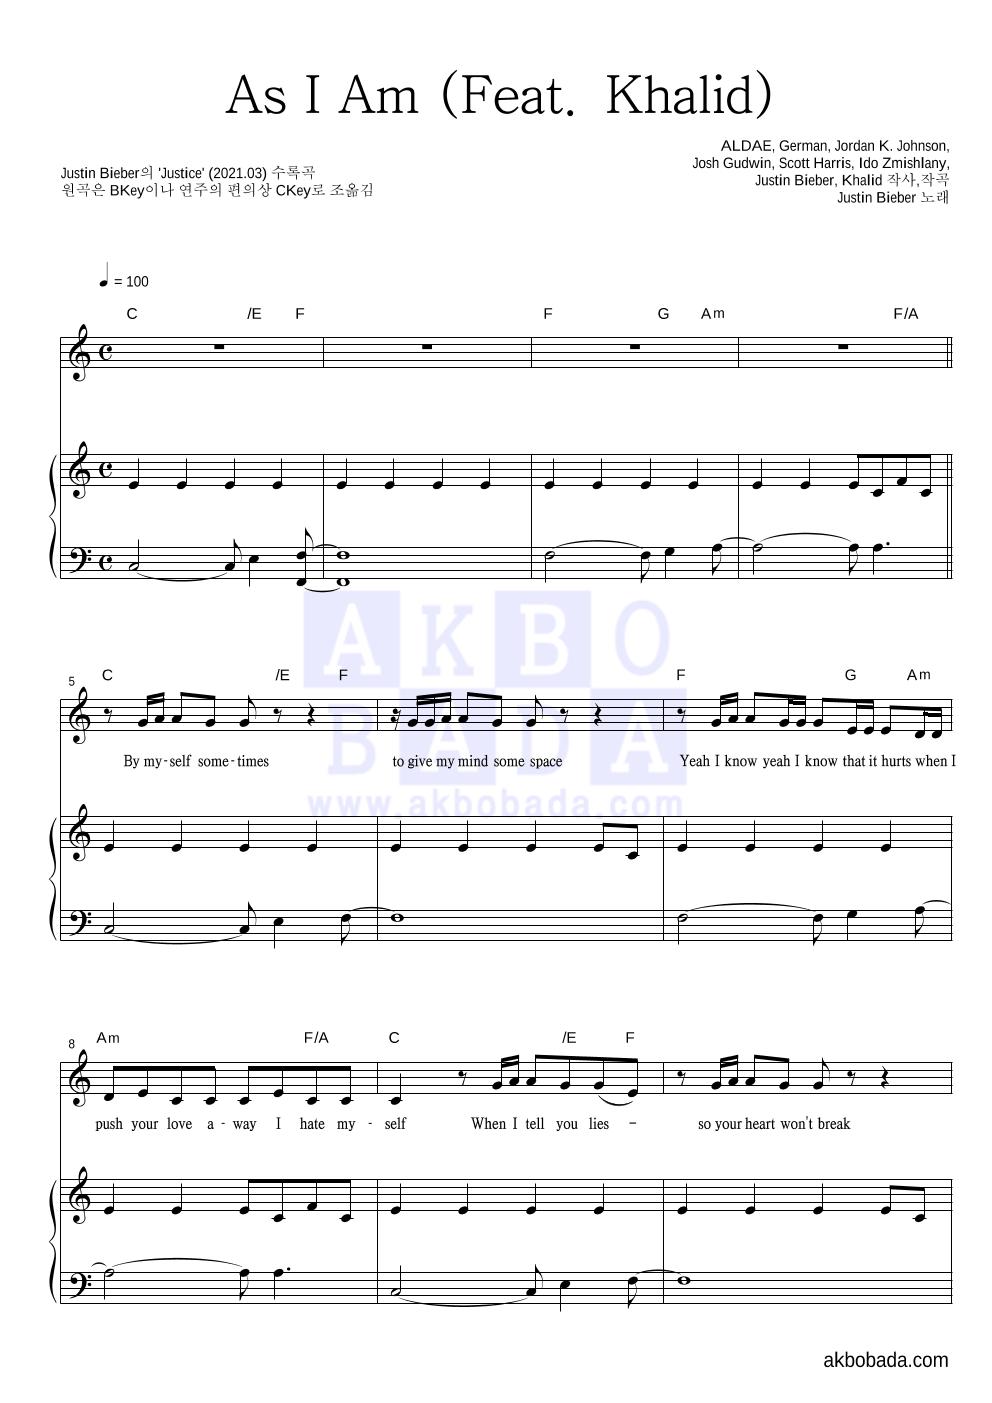 Justin Bieber - As I Am (Feat. Khalid) 피아노 3단 악보